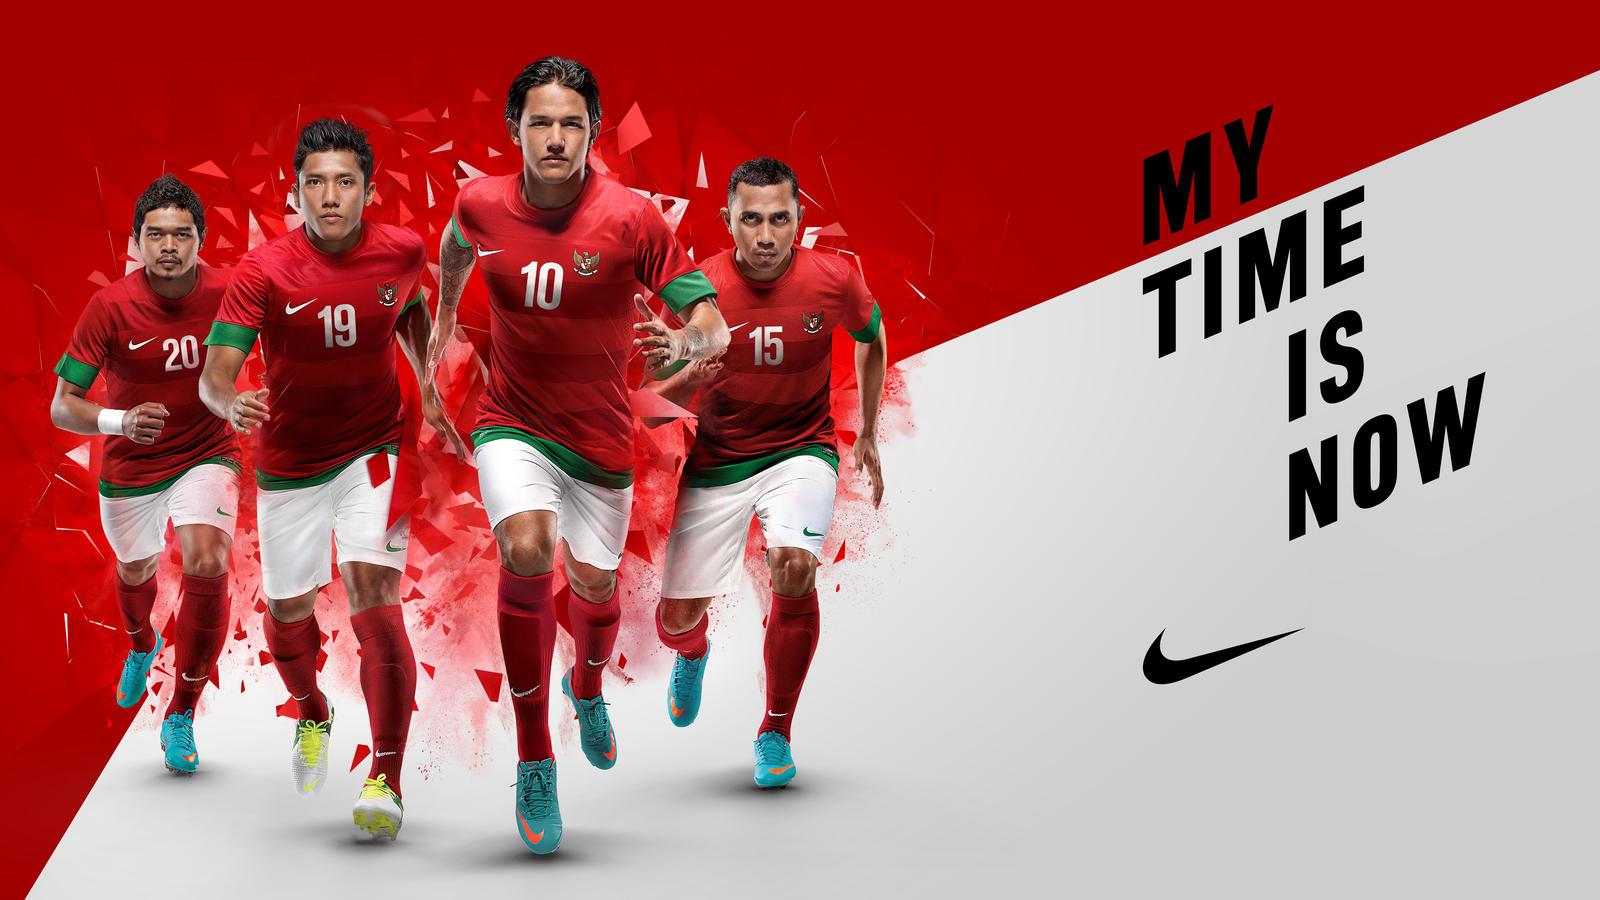 Nike Football Team Shoes